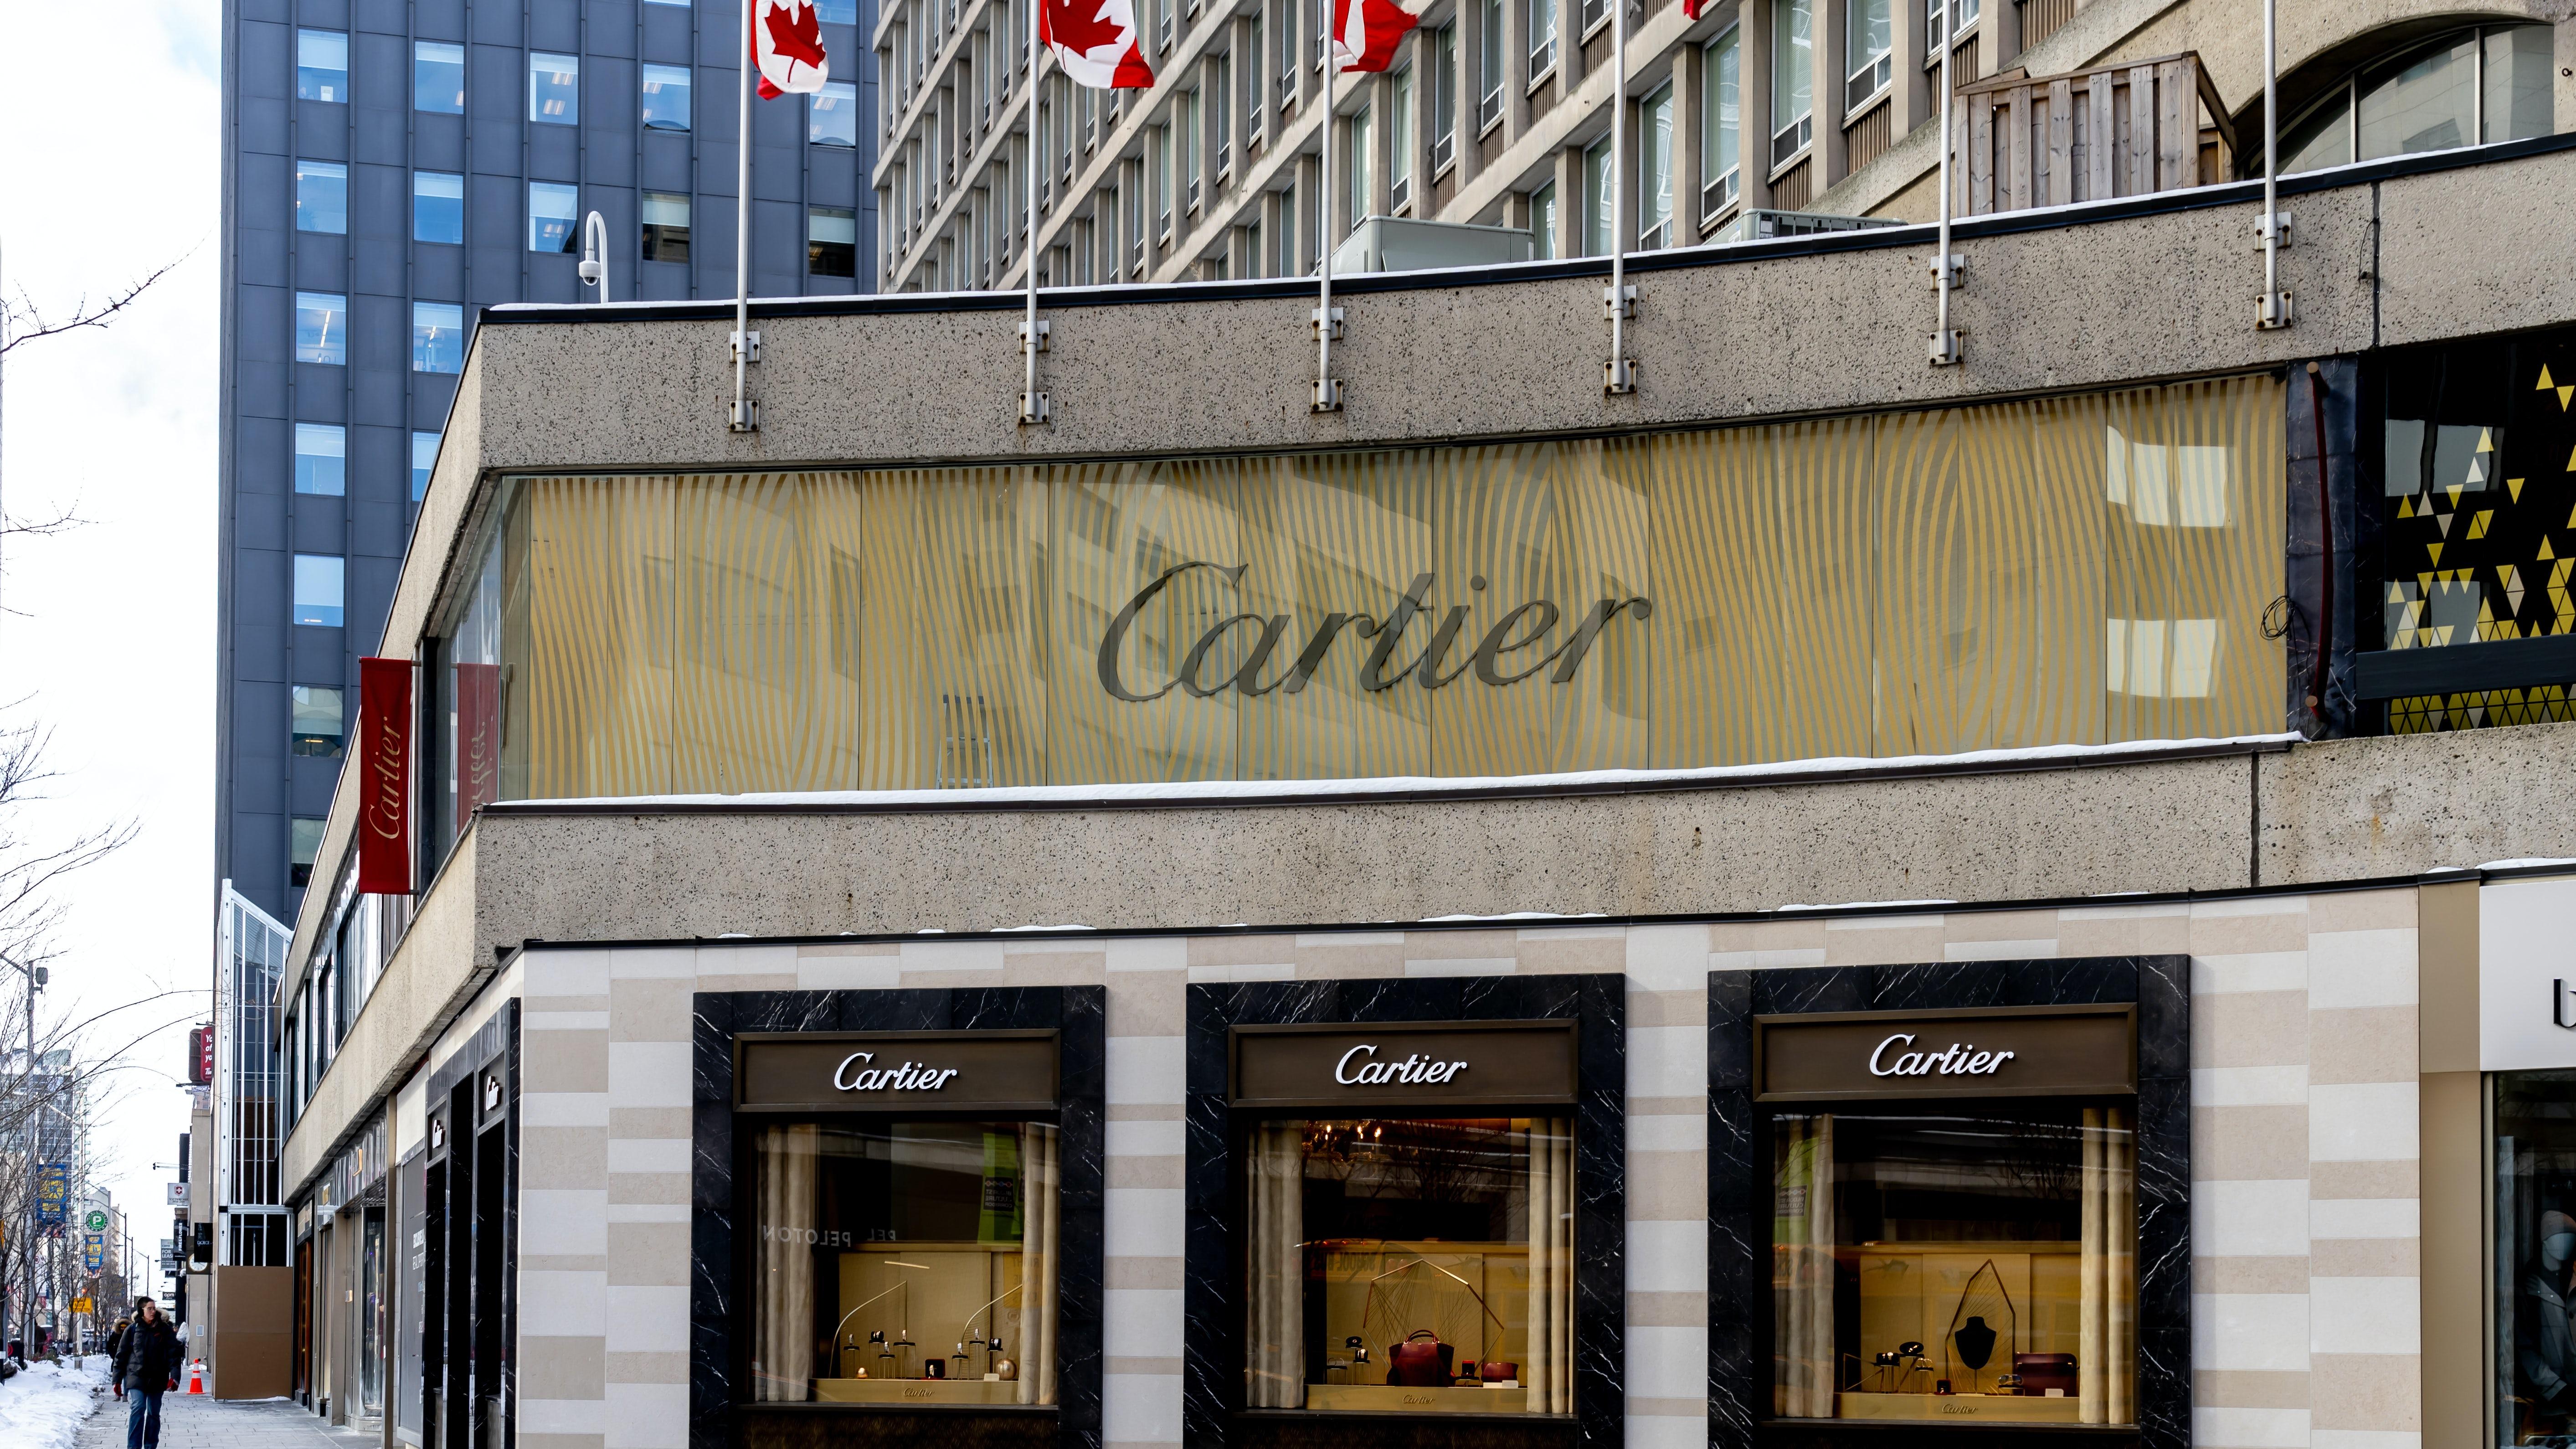 Cartier store in Toronto's Yorkville Neighbourhood | Source: Shutterstock